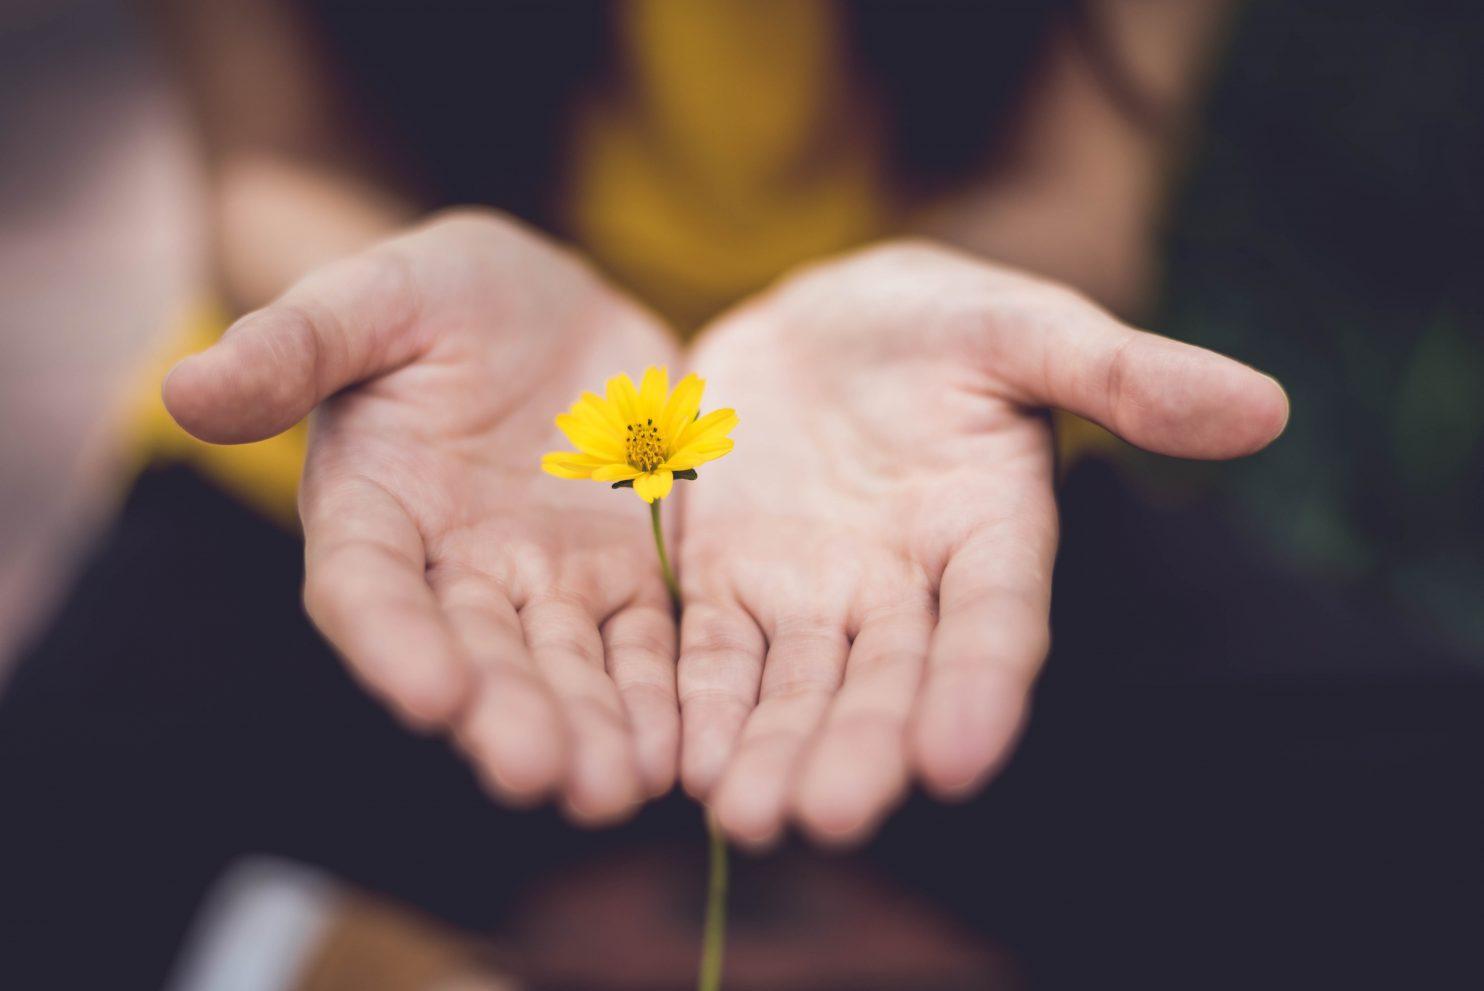 Elu nagu lill EFT-ga